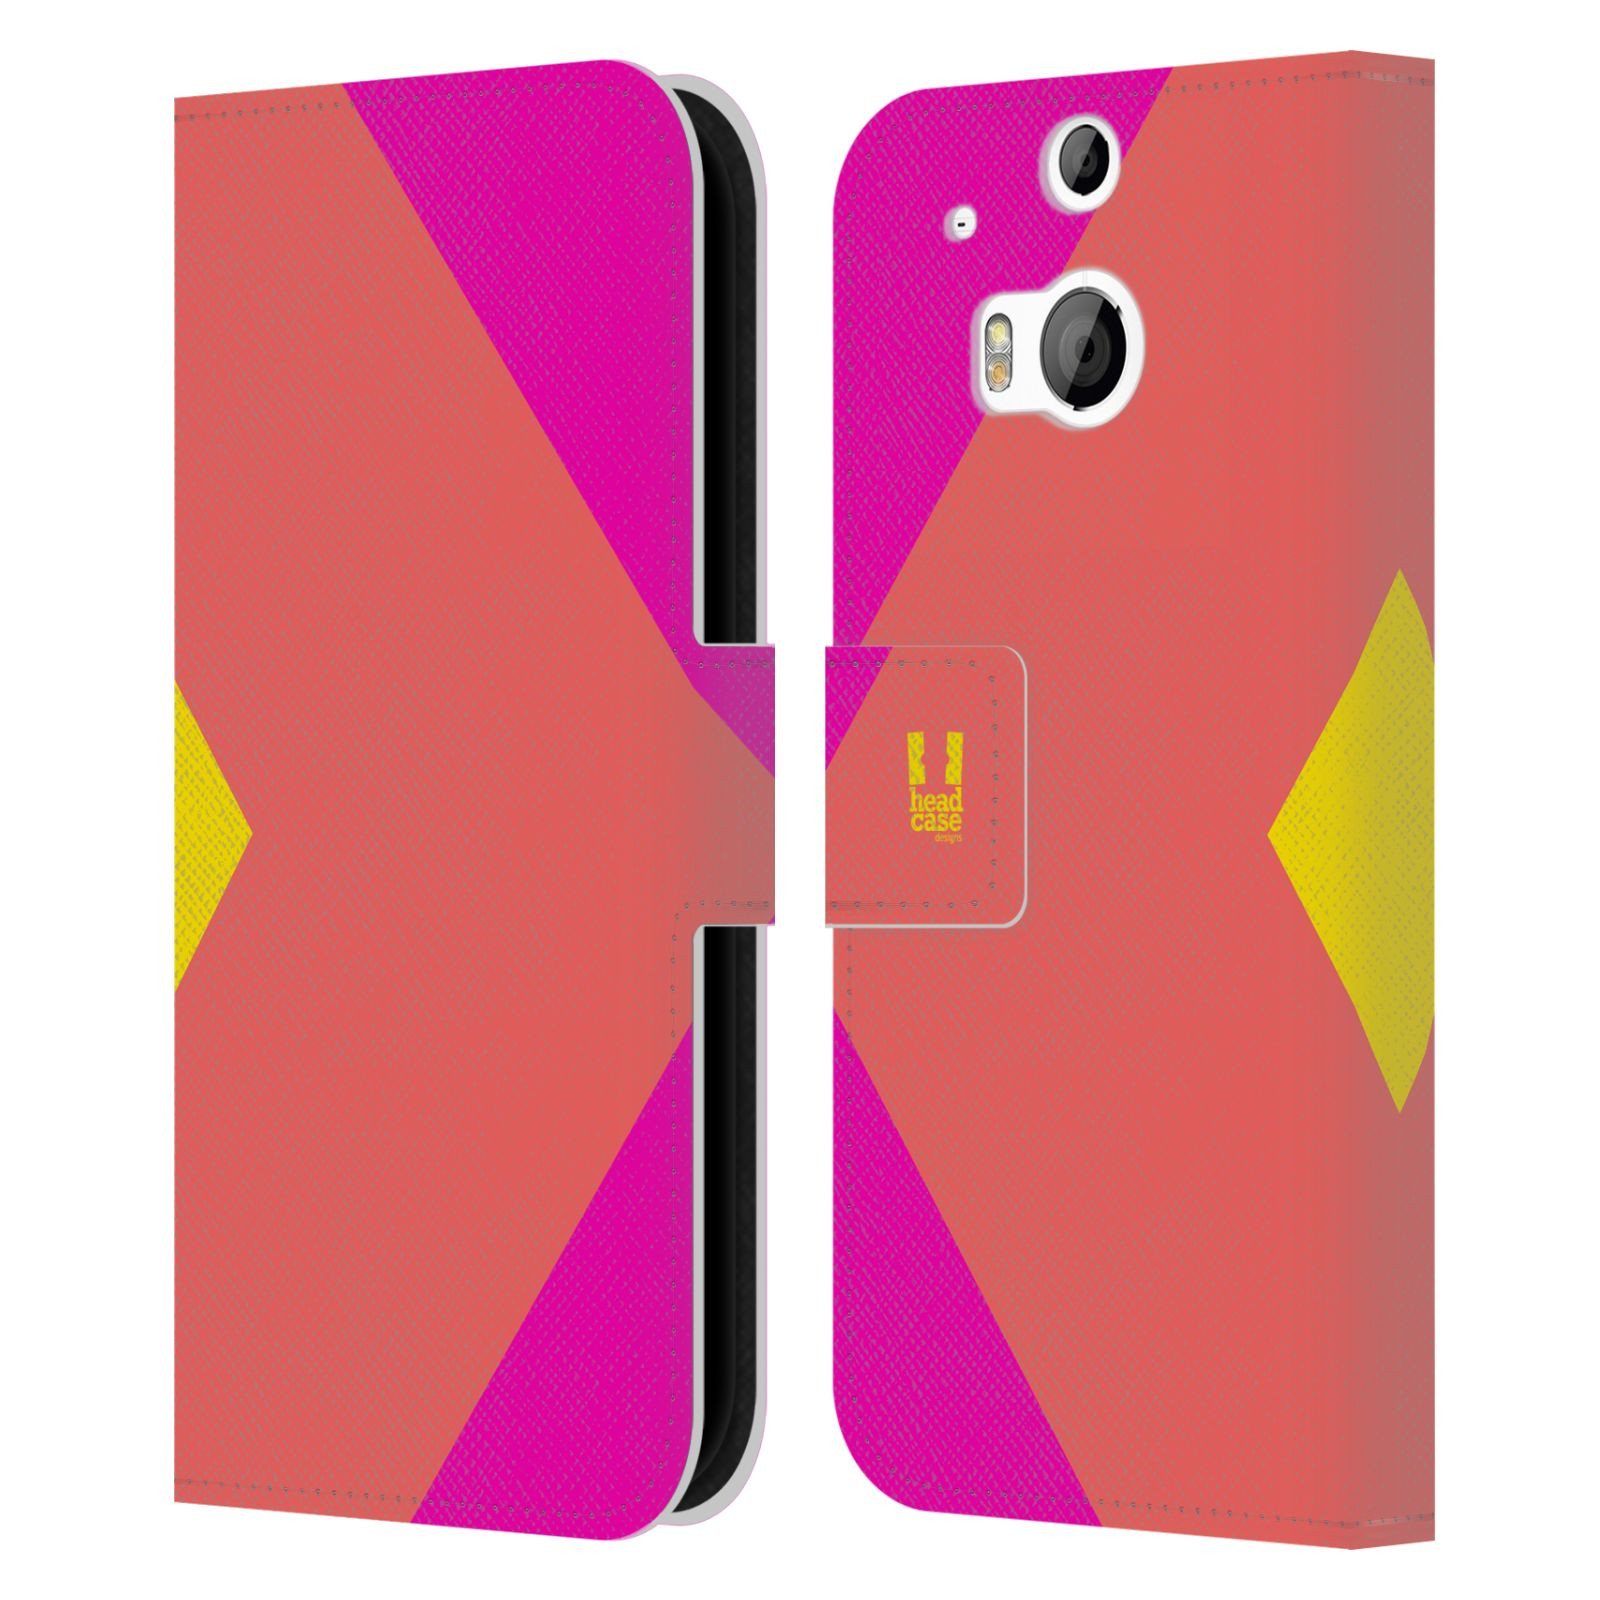 HEAD CASE Flipové pouzdro pro mobil HTC ONE M8/M8s barevné tvary růžová korál